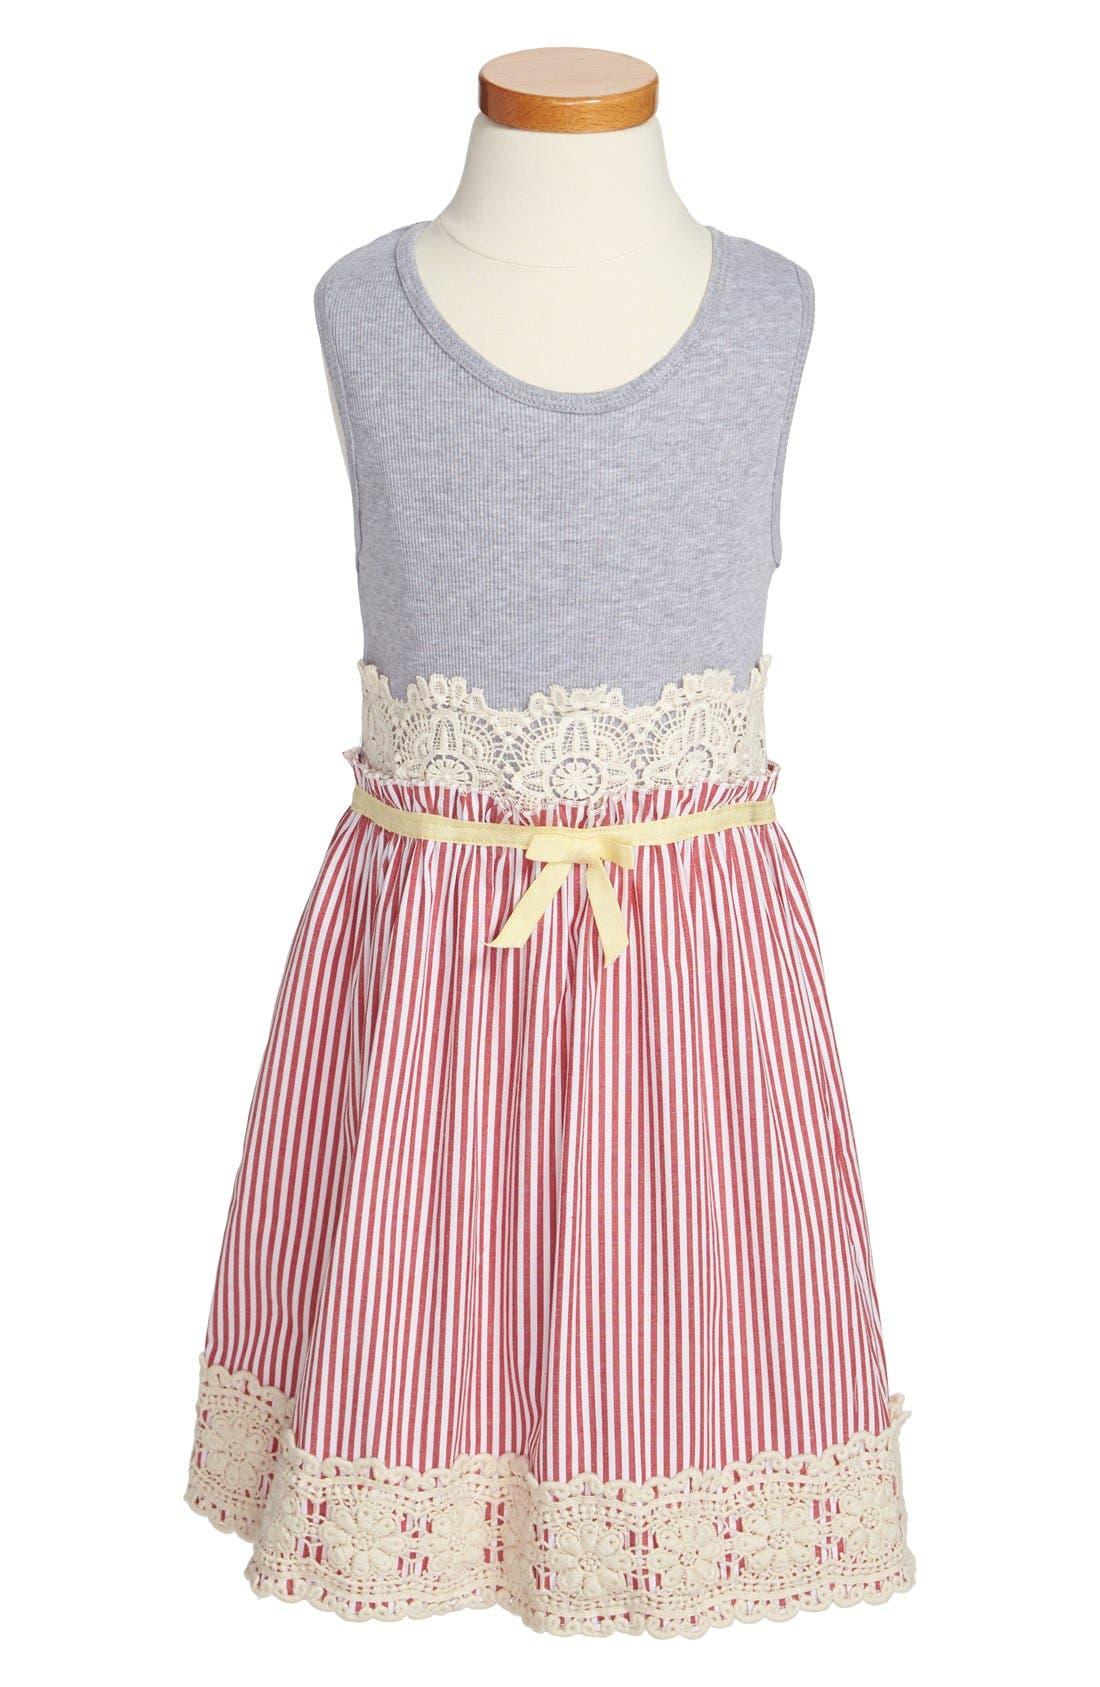 Alternate Image 1 Selected - Twirls & Twigs Sleeveless Dress (Little Girls & Big Girls)